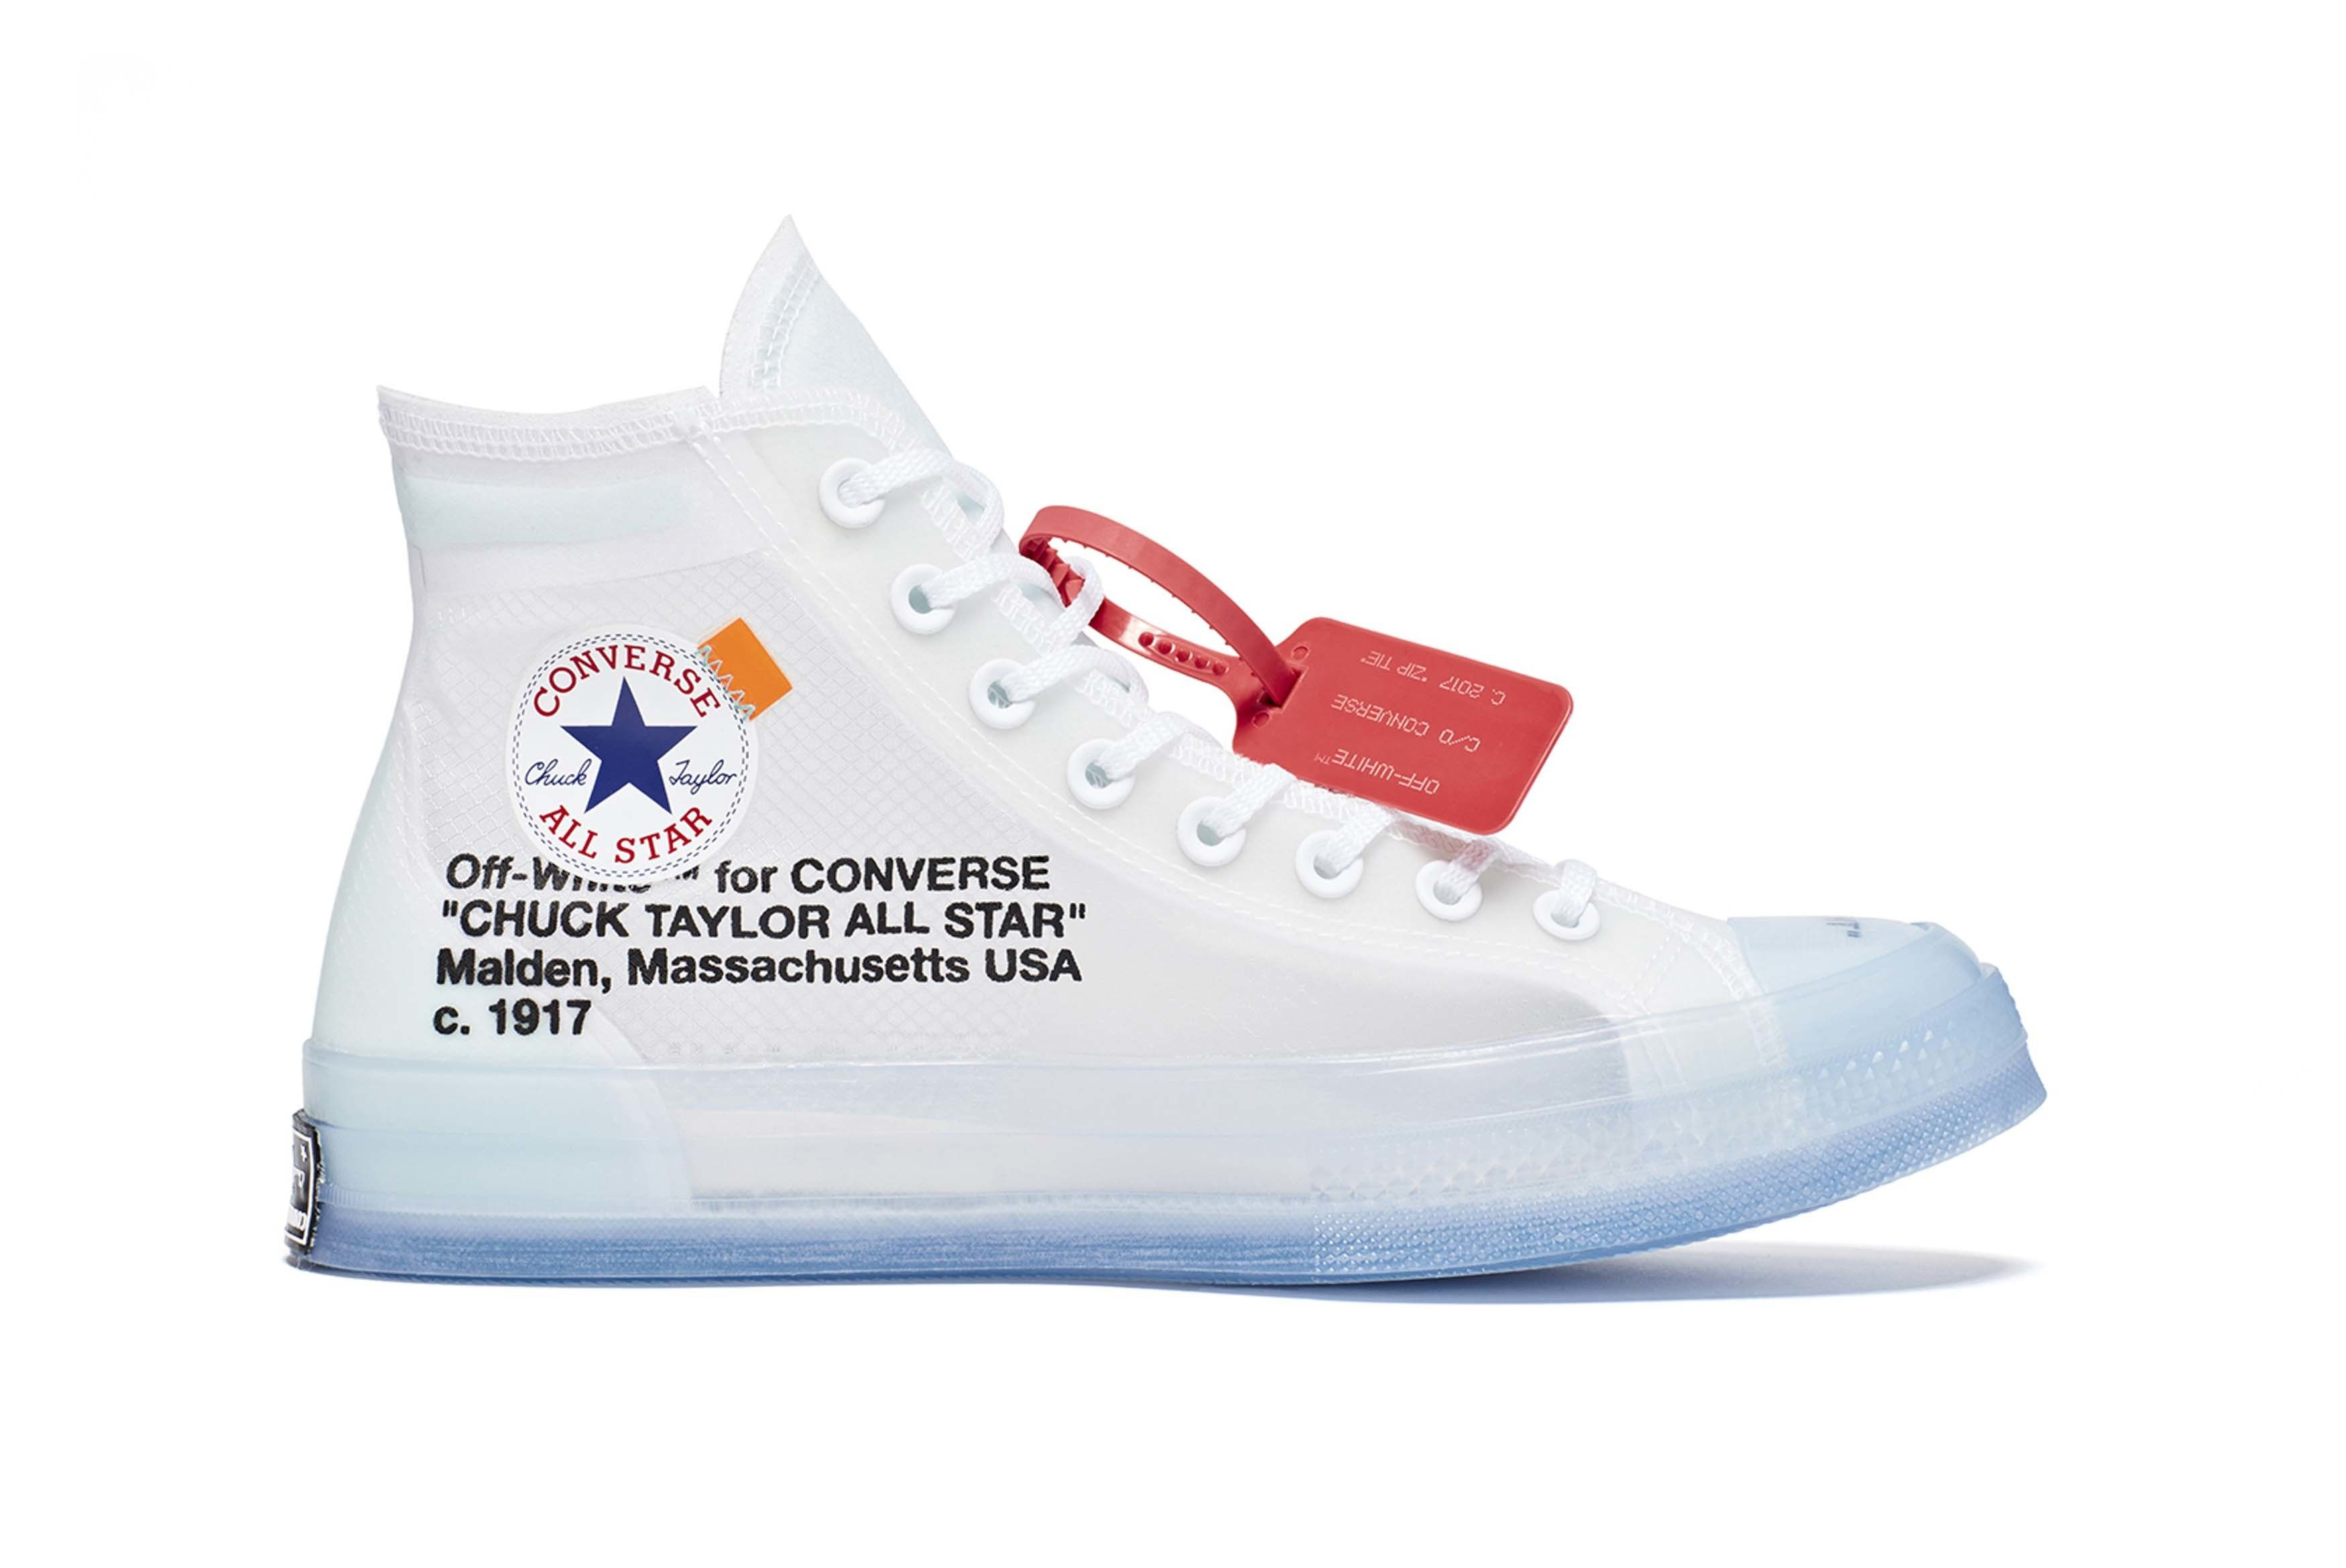 7da35d30c35b Be First to Cop the Off-White x Converse Chuck 70 - Sneaker Freaker